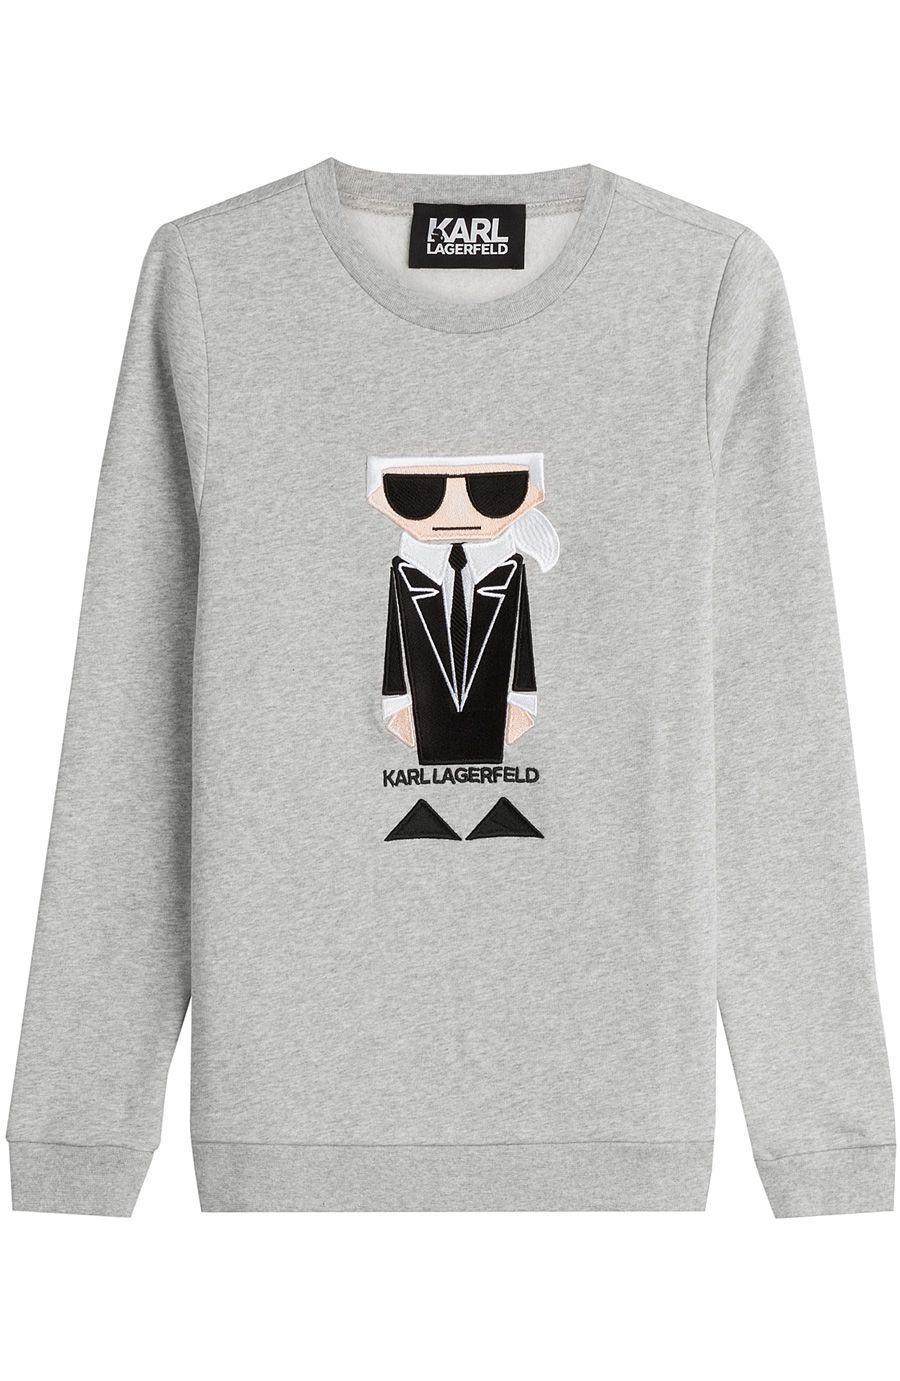 KARL LAGERFELD Kocktail Karl Cotton Sweatshirt.  karllagerfeld  cloth   sweatshirts 6e86f426564